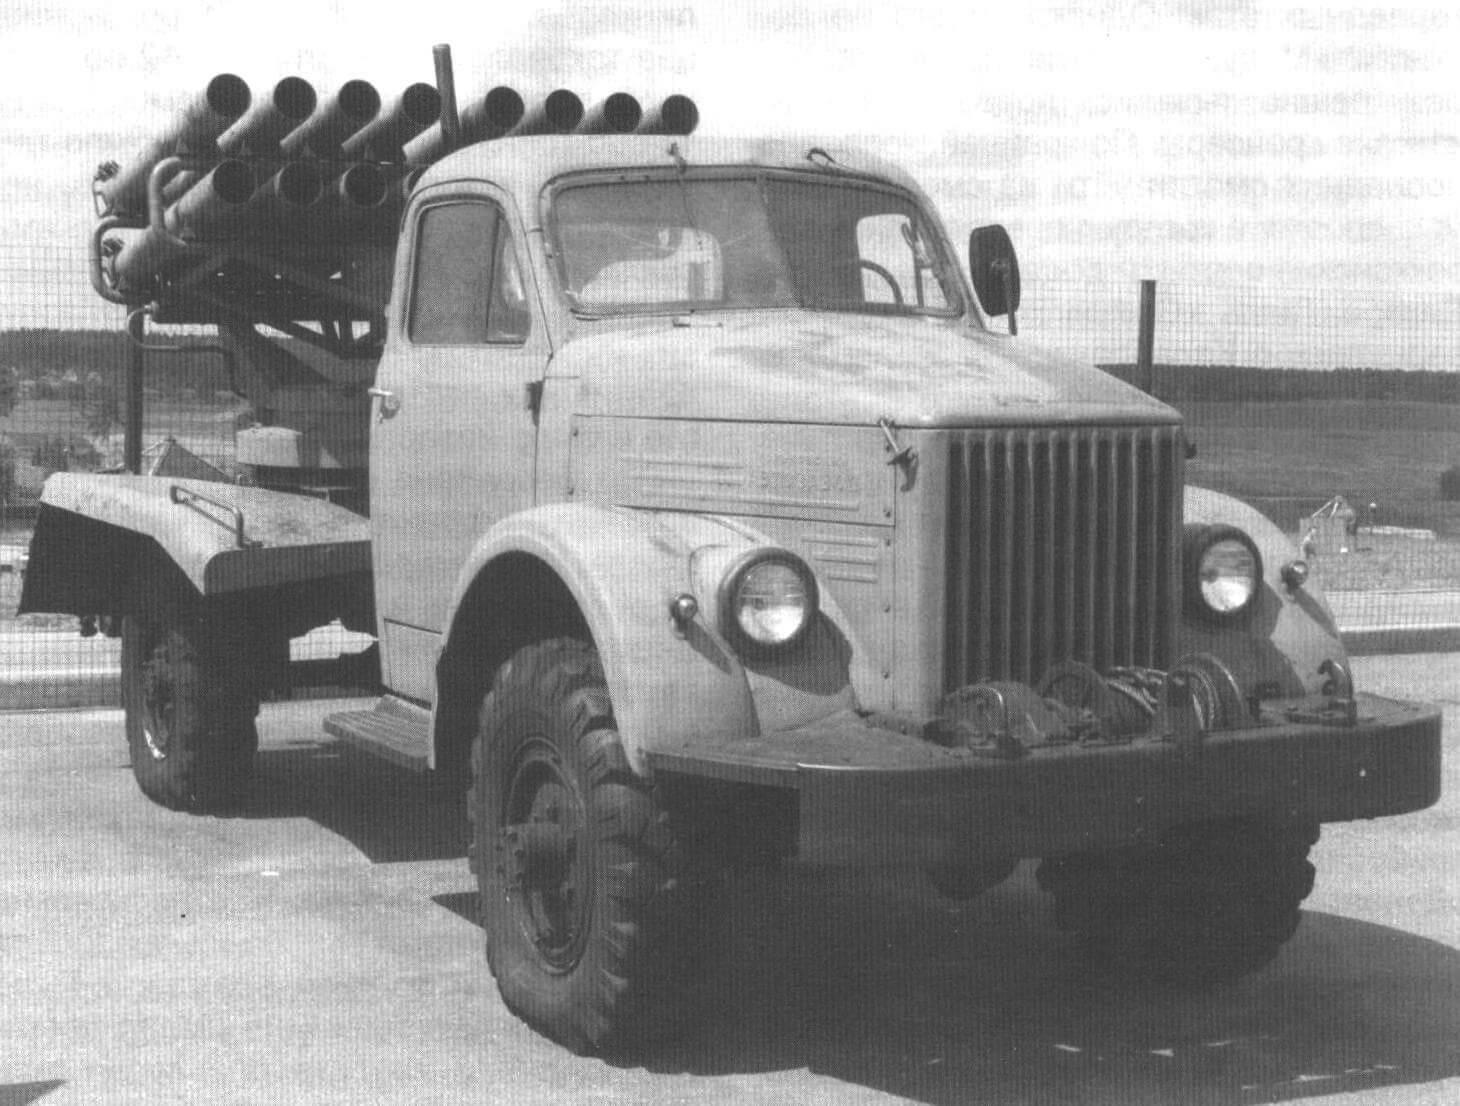 Автомобиль ГАЗ-63 с системой залпового огня